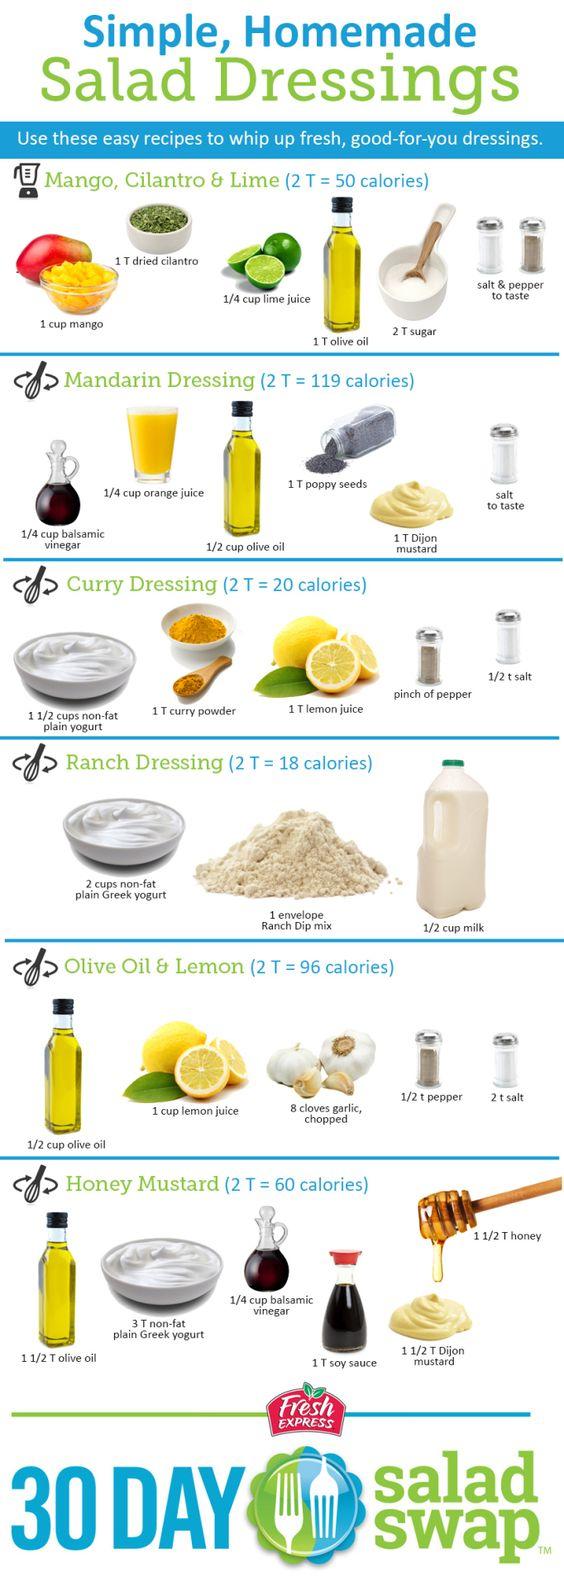 Simple, Homemade Salad Dressing Ideas. #saladswap #FreshExpress http://www.saladswap.com/